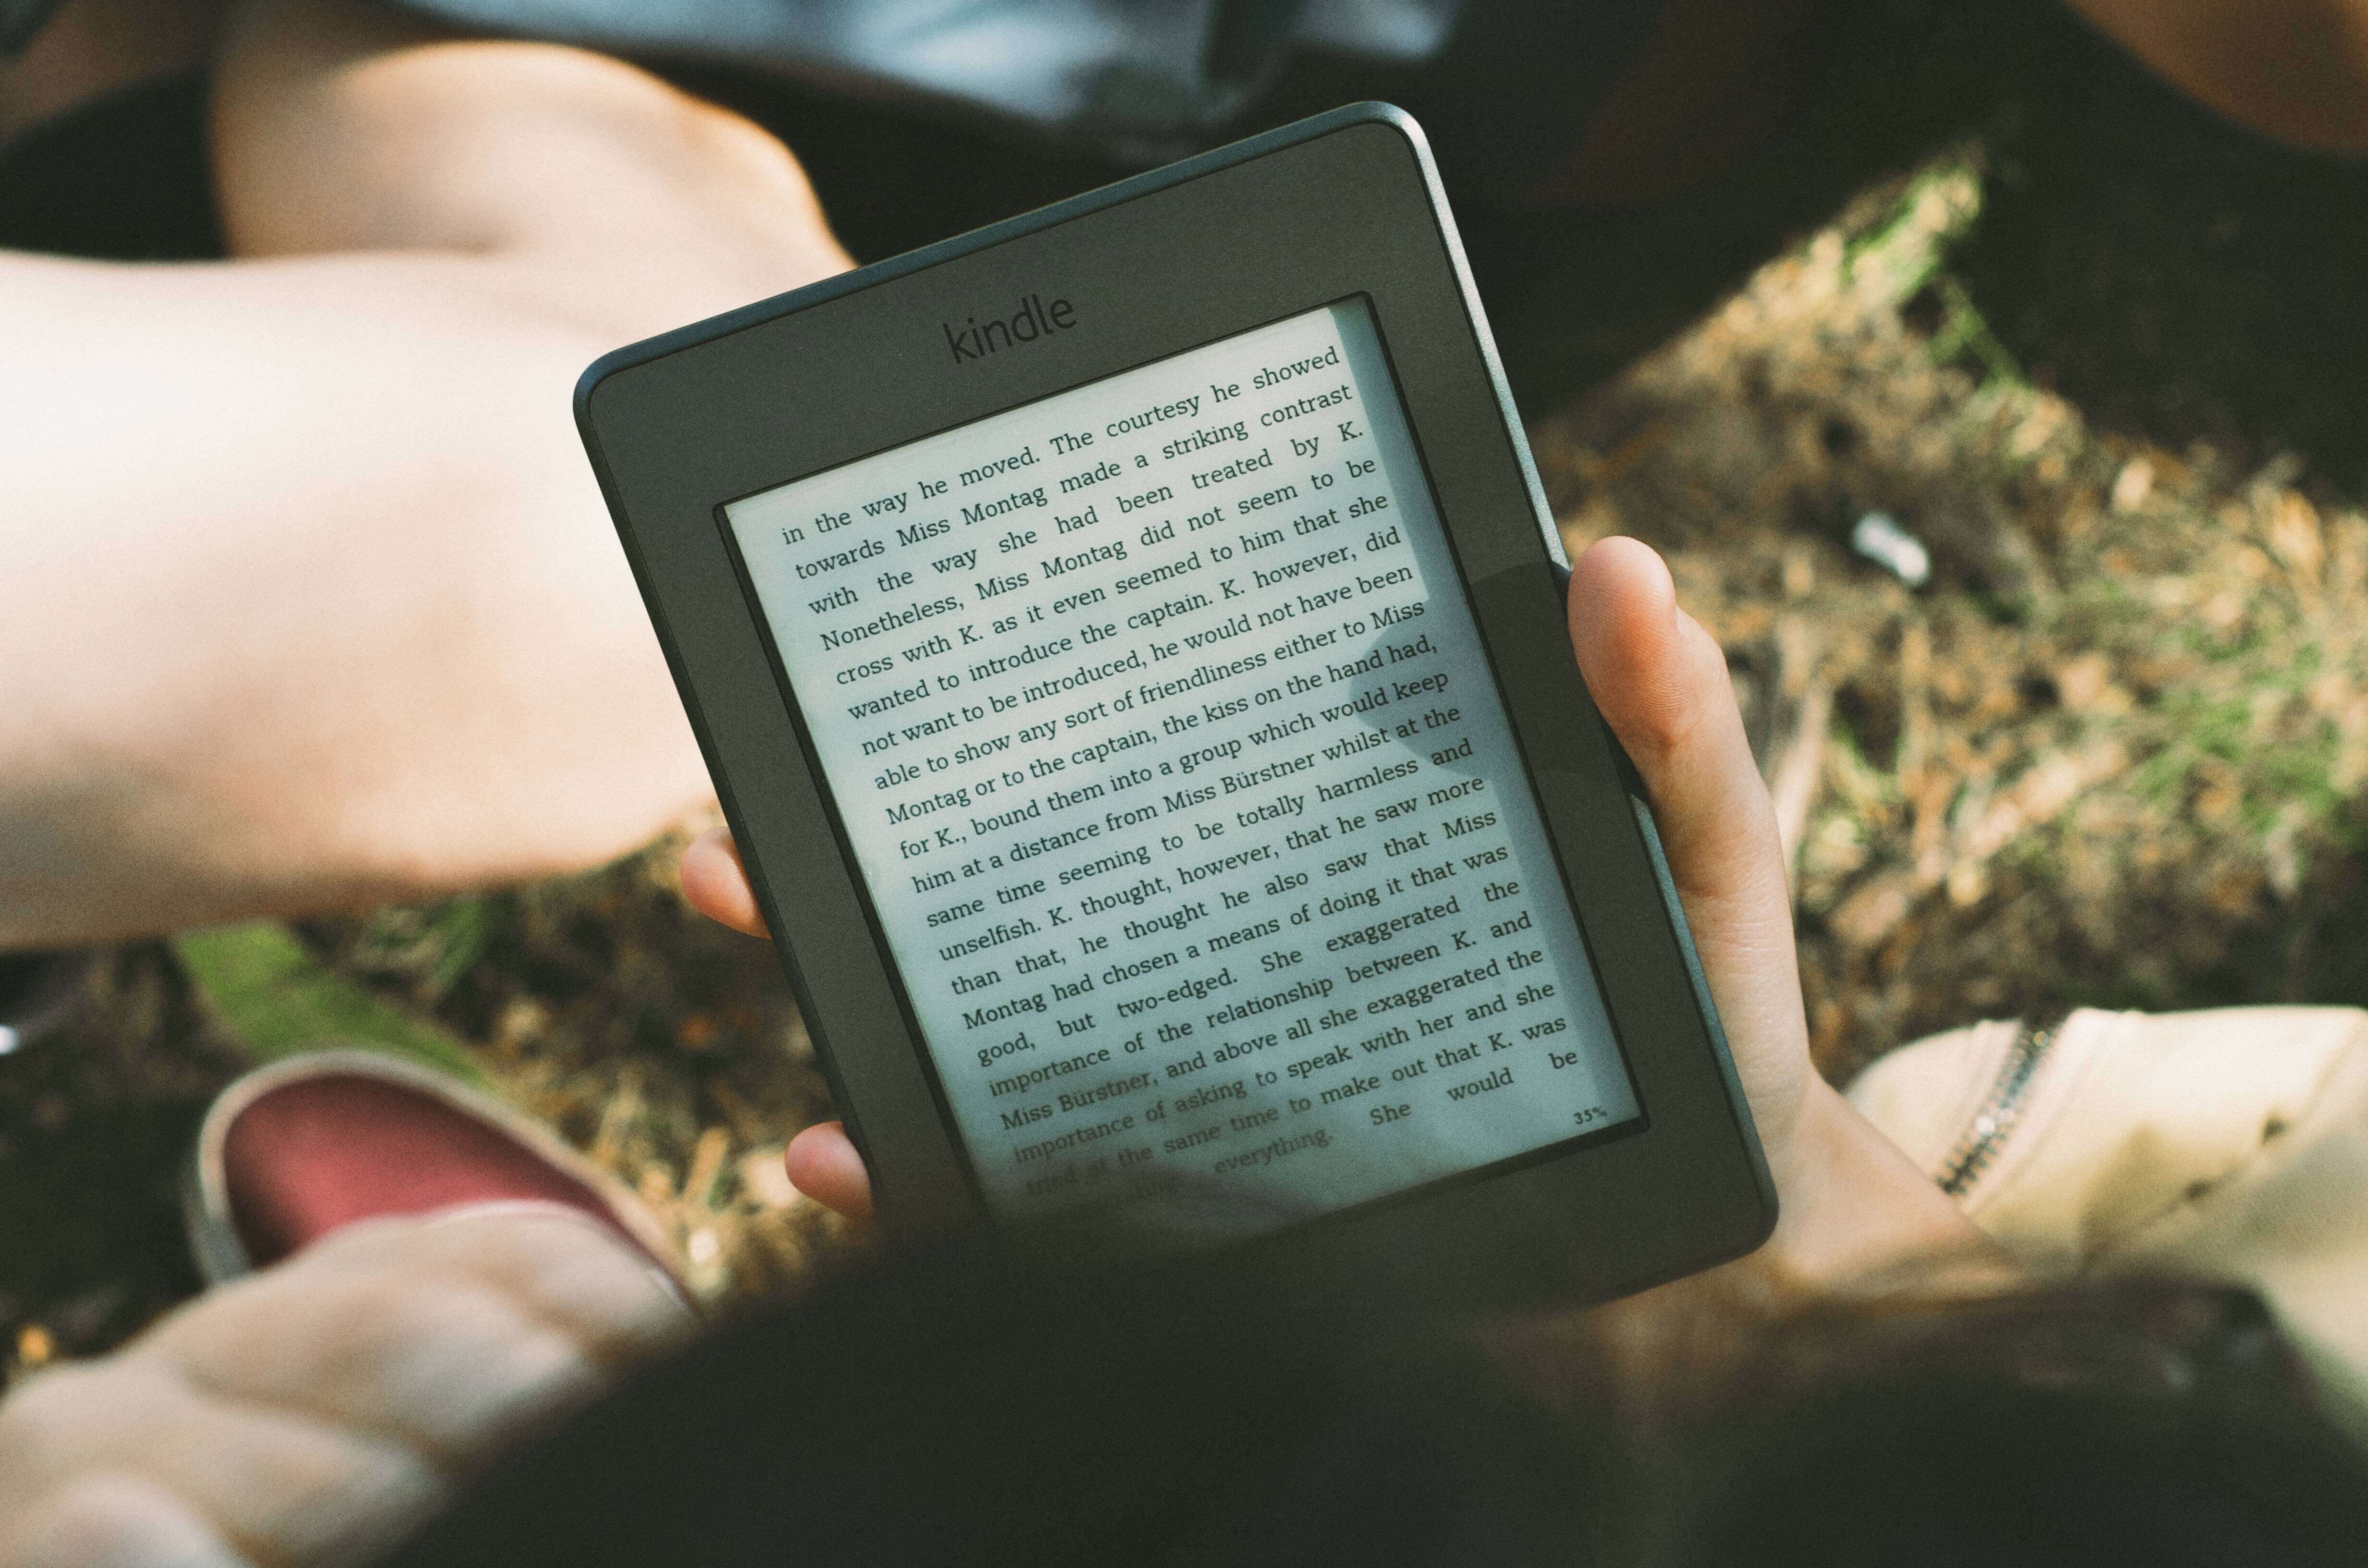 【Amazonの本読み放題サービス】Kindle UnlimitedとPrime Readingって何が違うの?